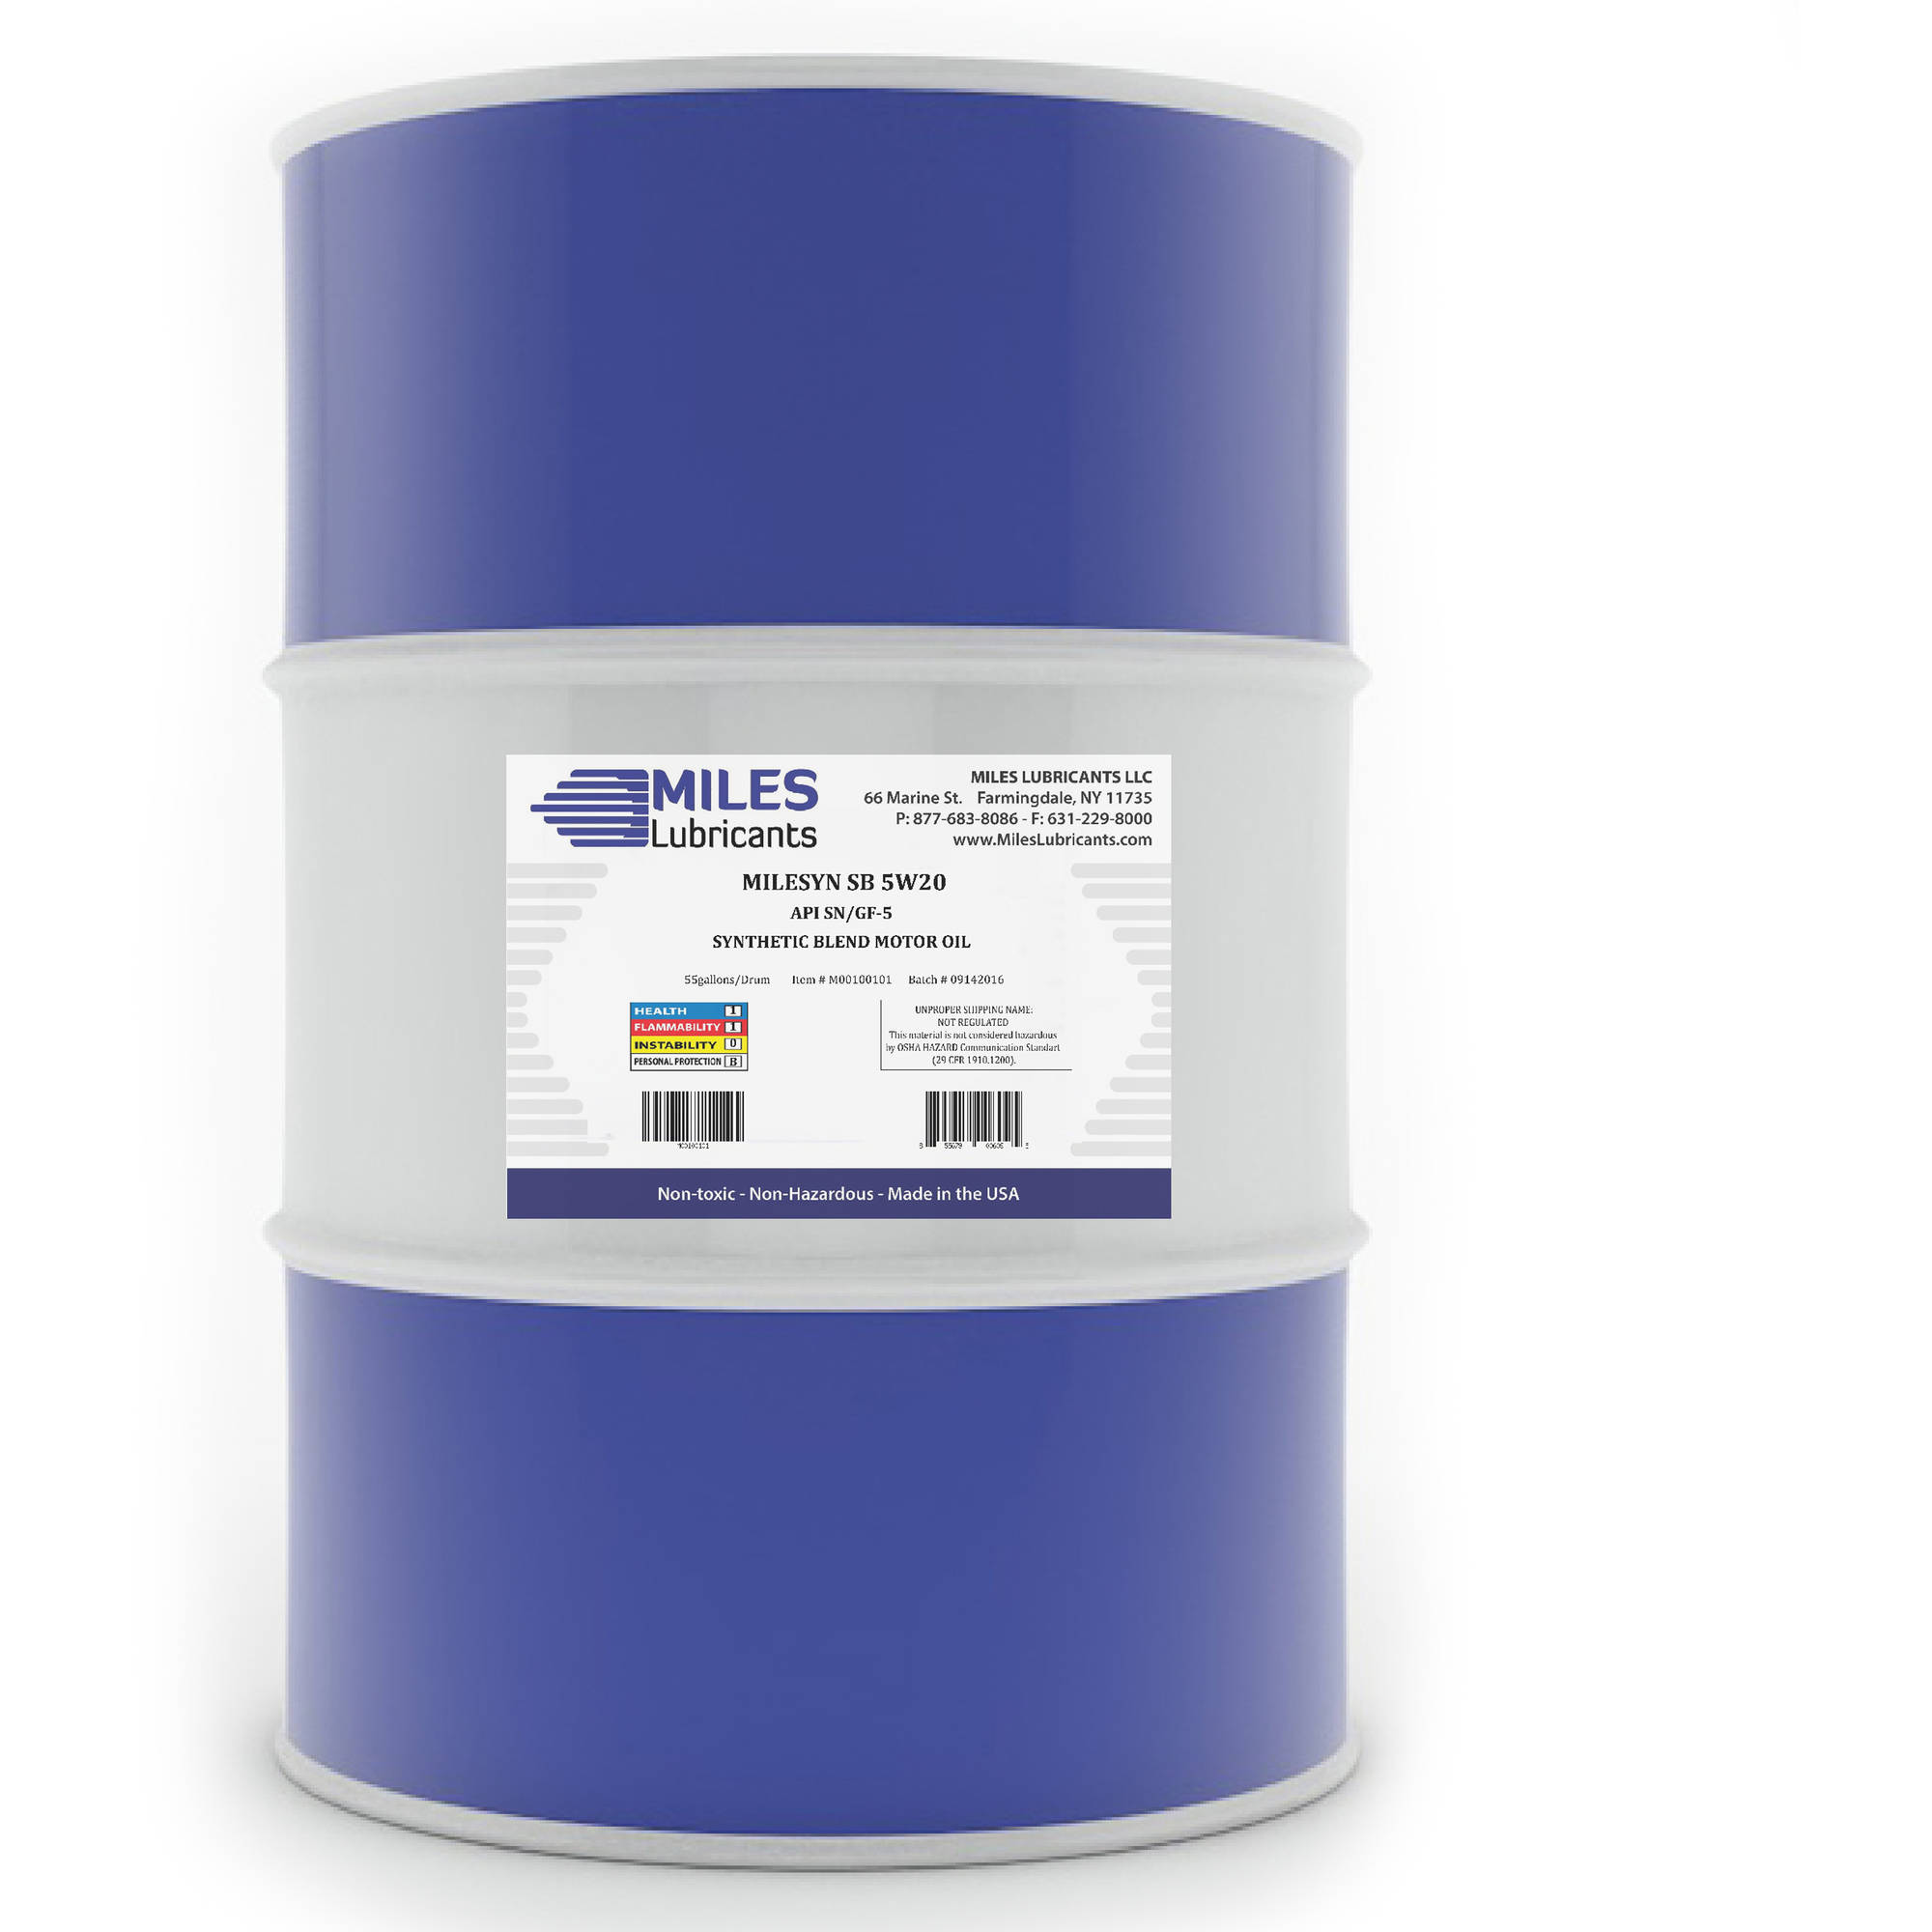 Milesyn SB 5W20 API GF-5/SN, Synthetic Blend Motor Oil, 55-Gallon Drum